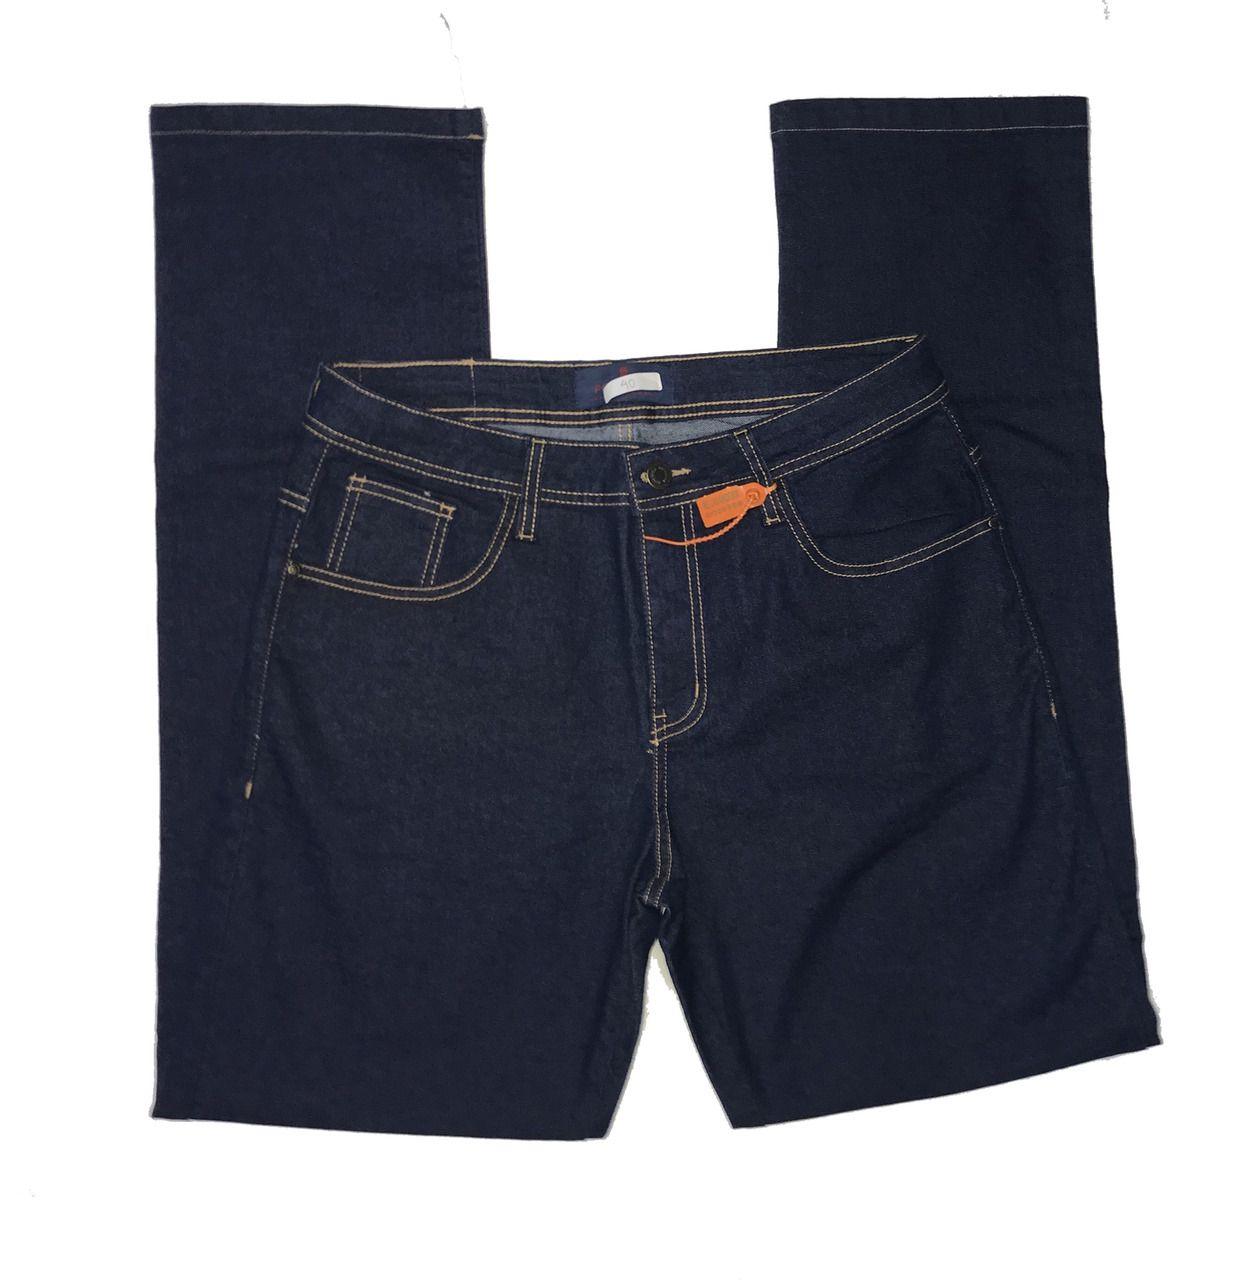 Calça Jeans Masculina Escura  - Boutique Mangalarga